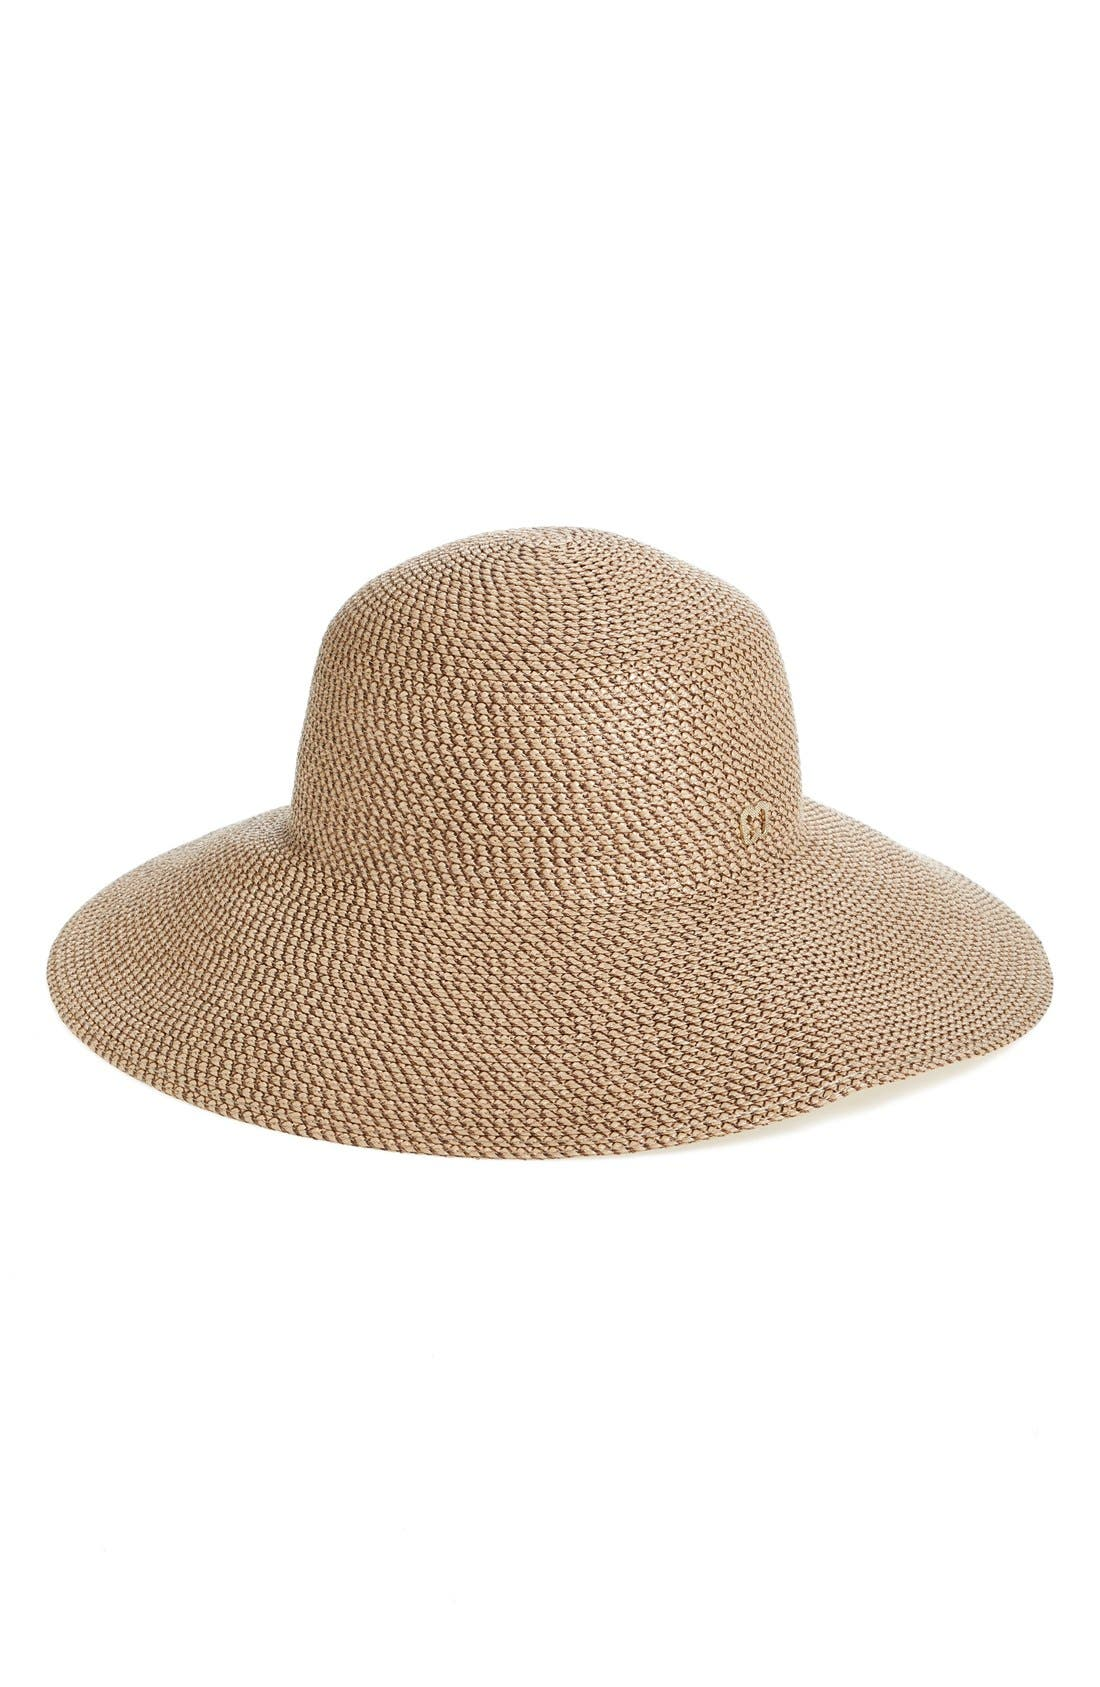 'Hampton' Straw Sun Hat